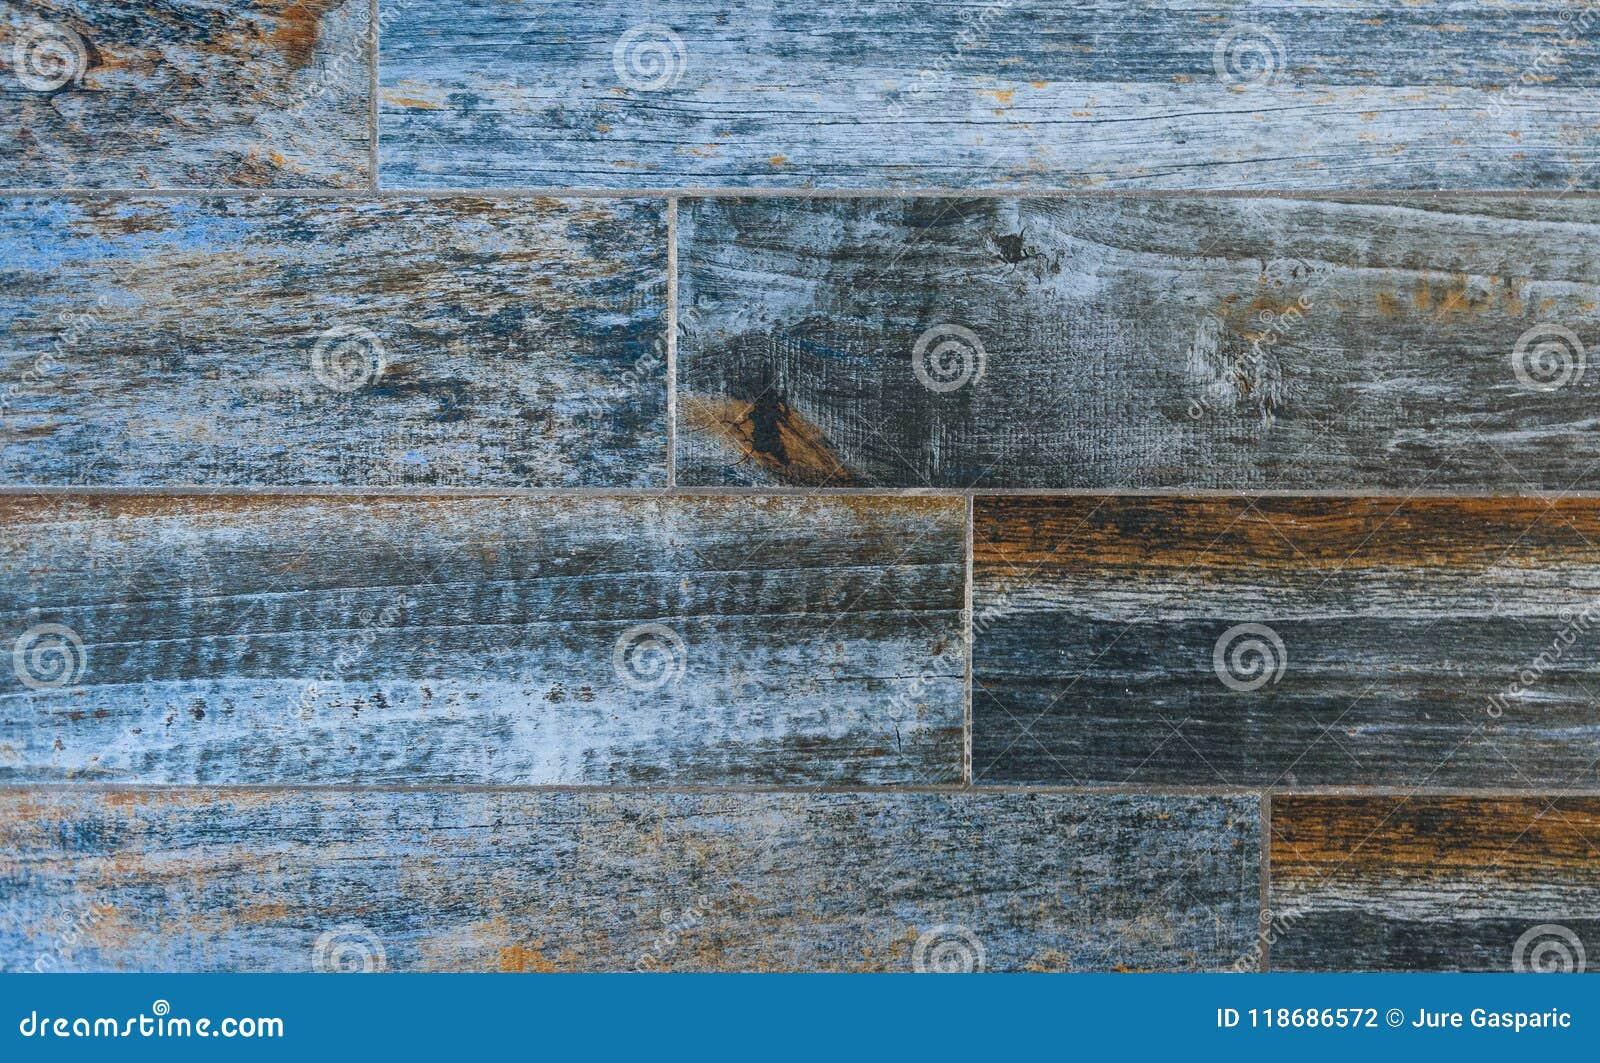 Interior Or Exterior Bathroom Or Kitchen Ceramic Tiles. Stock Photo ...